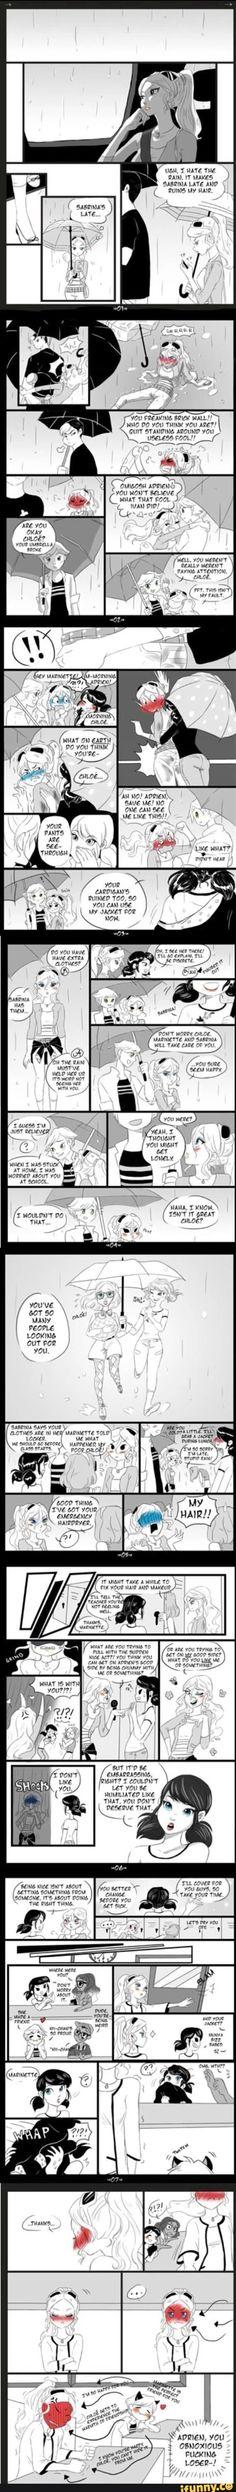 Got mixed feelings of whether mari would do that, but comics too cute omg